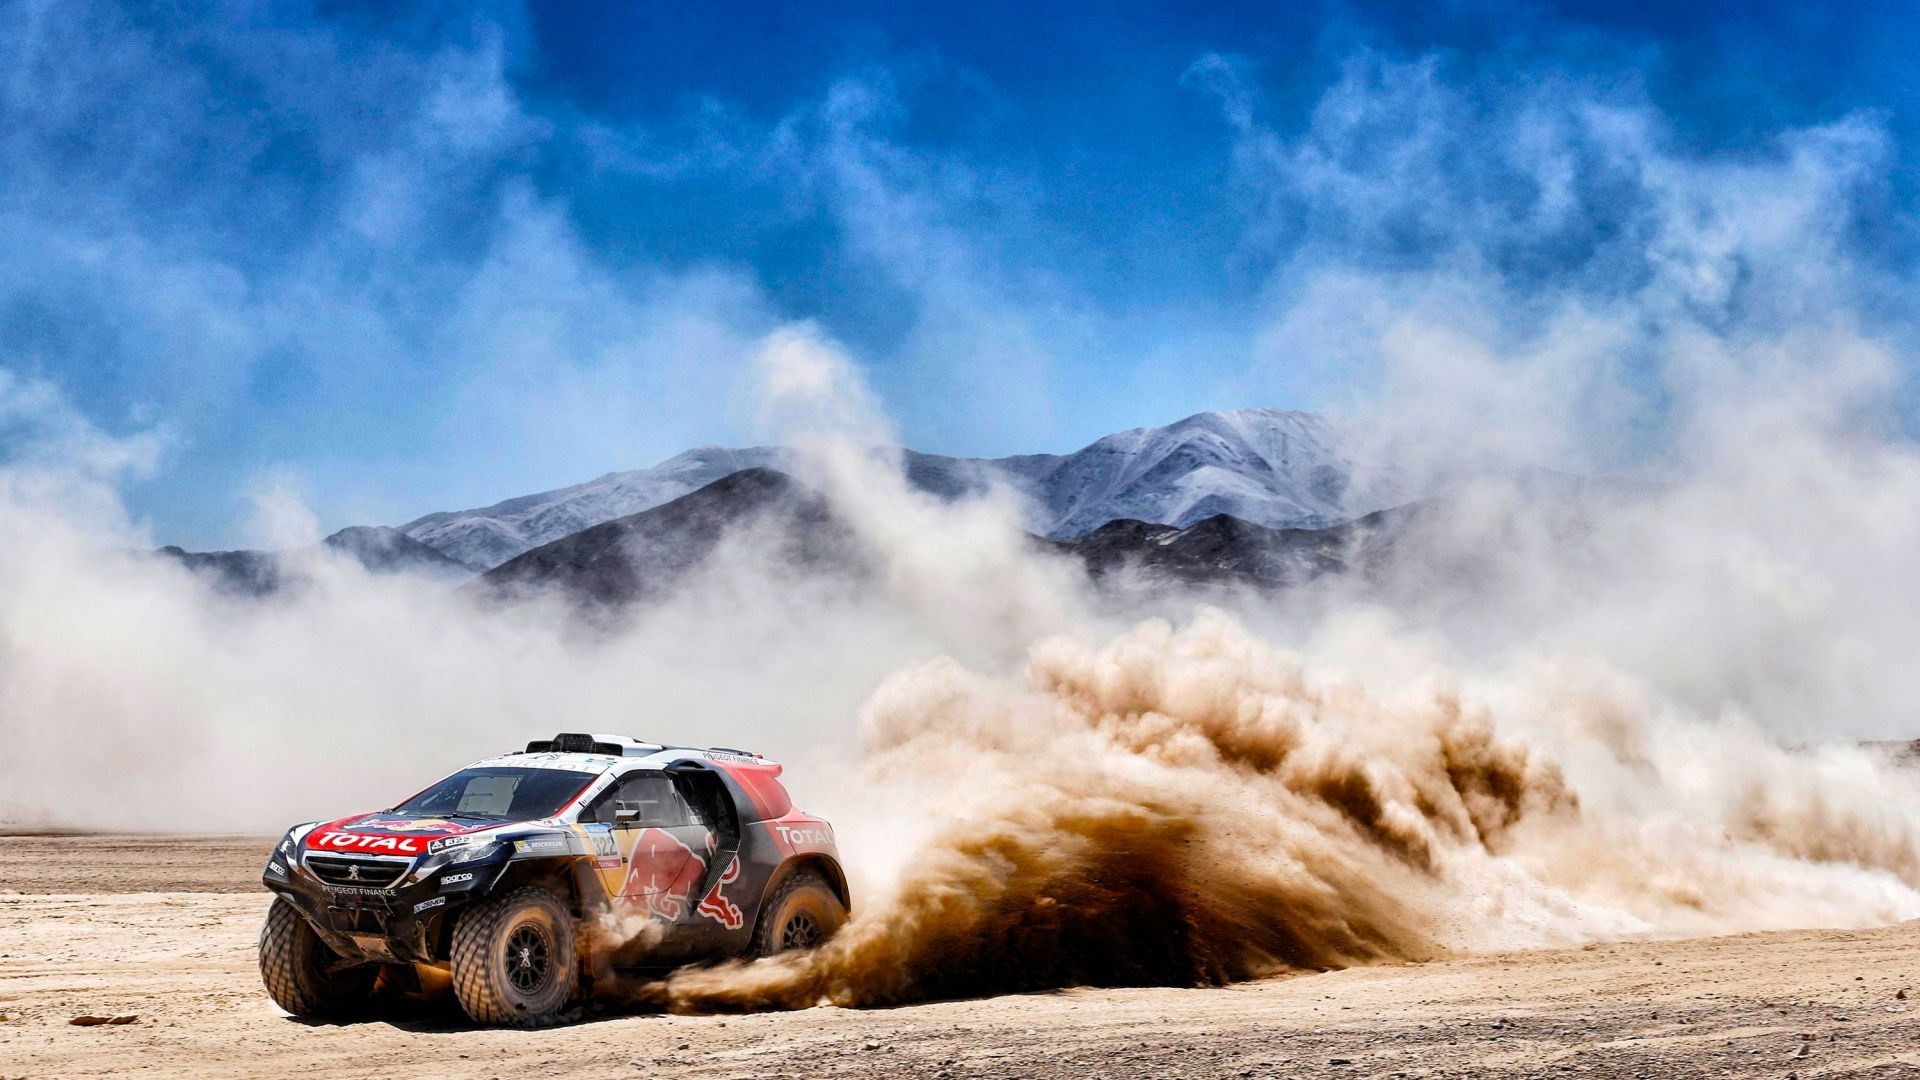 Desktop Wallpaper Rallying Dusk Sports Car Race Hd Image Picture Background 07fe76 Dakar Racing Fast Sports Cars